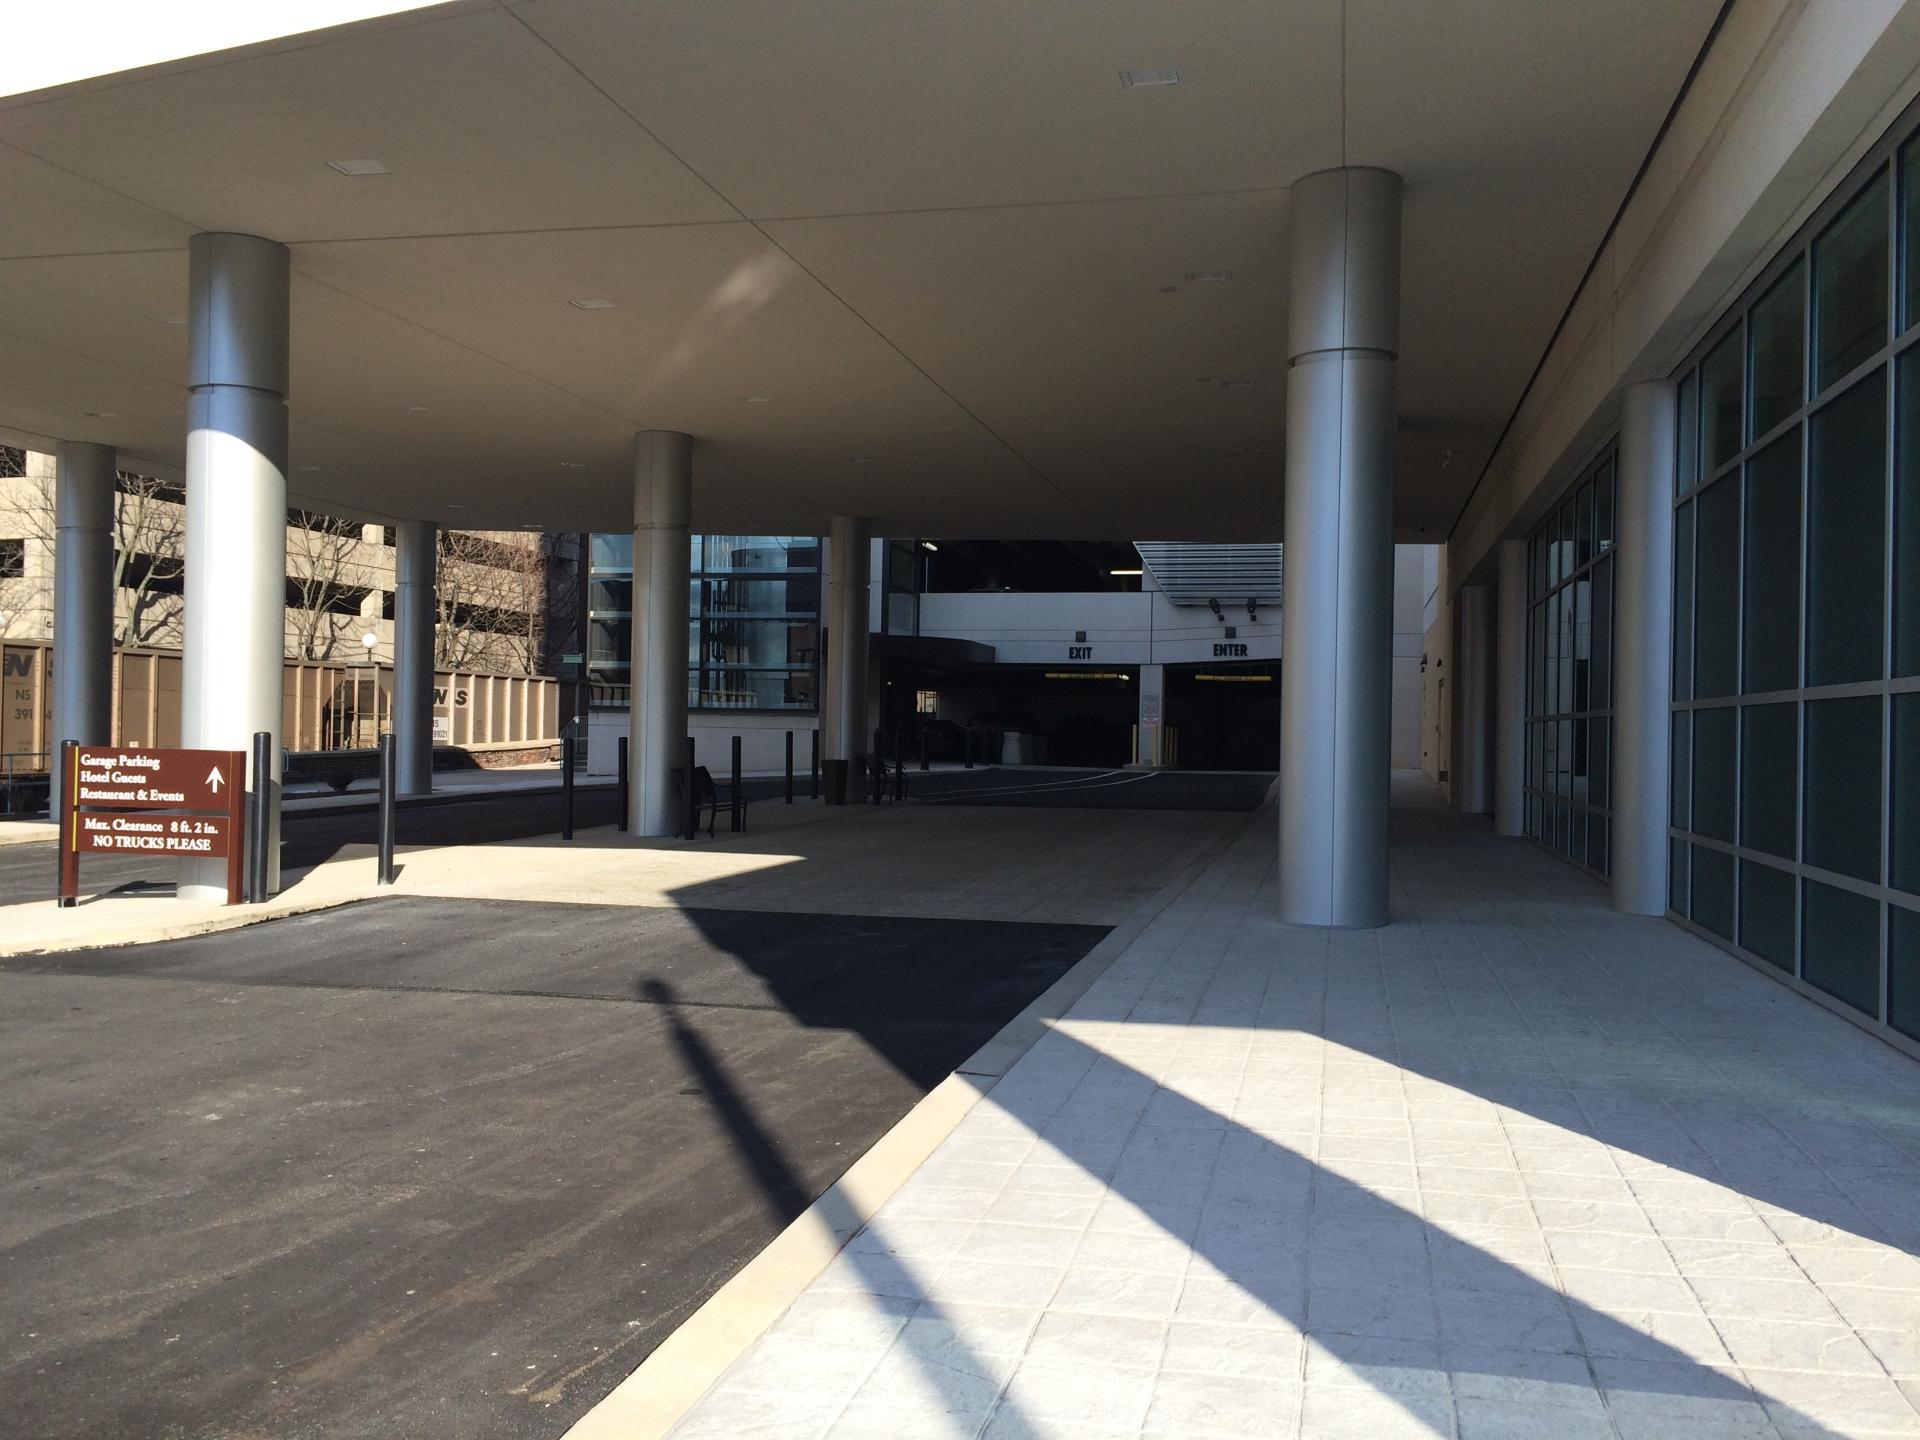 Double Tree Hotel Parking Garage, Civil Engineerig, Traffic Engineering